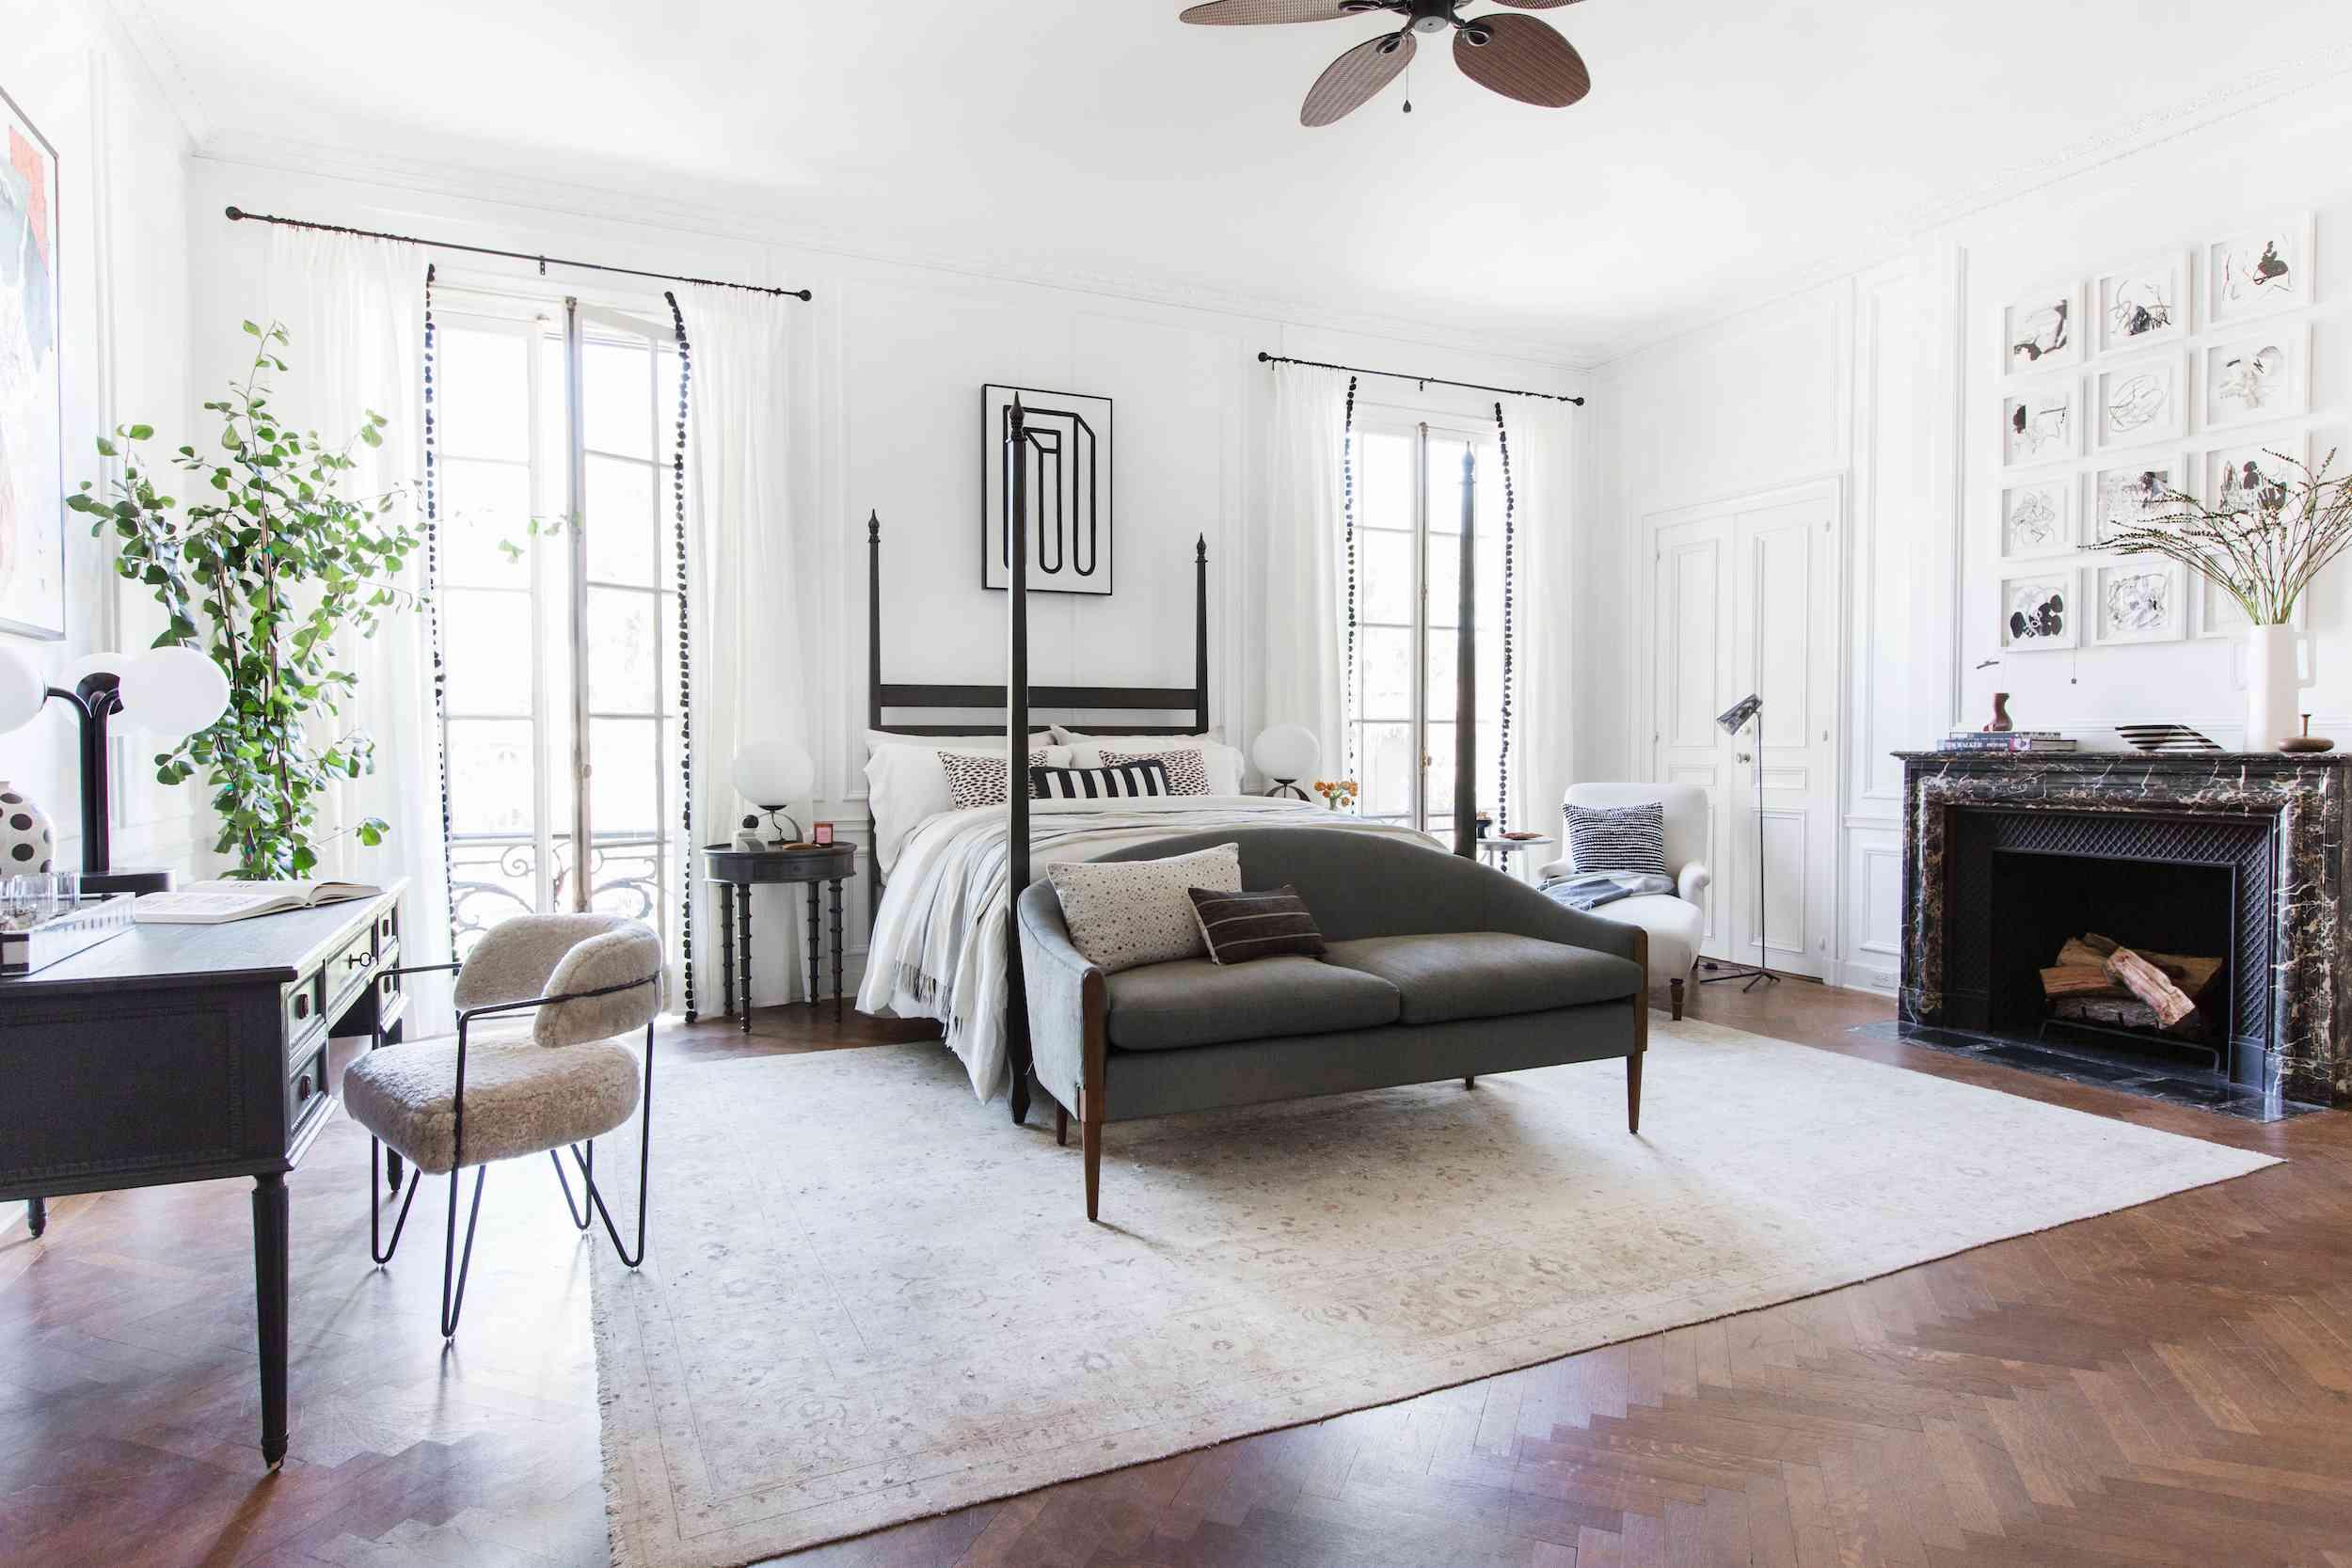 neutral bedroom designed like upscale hotel suite